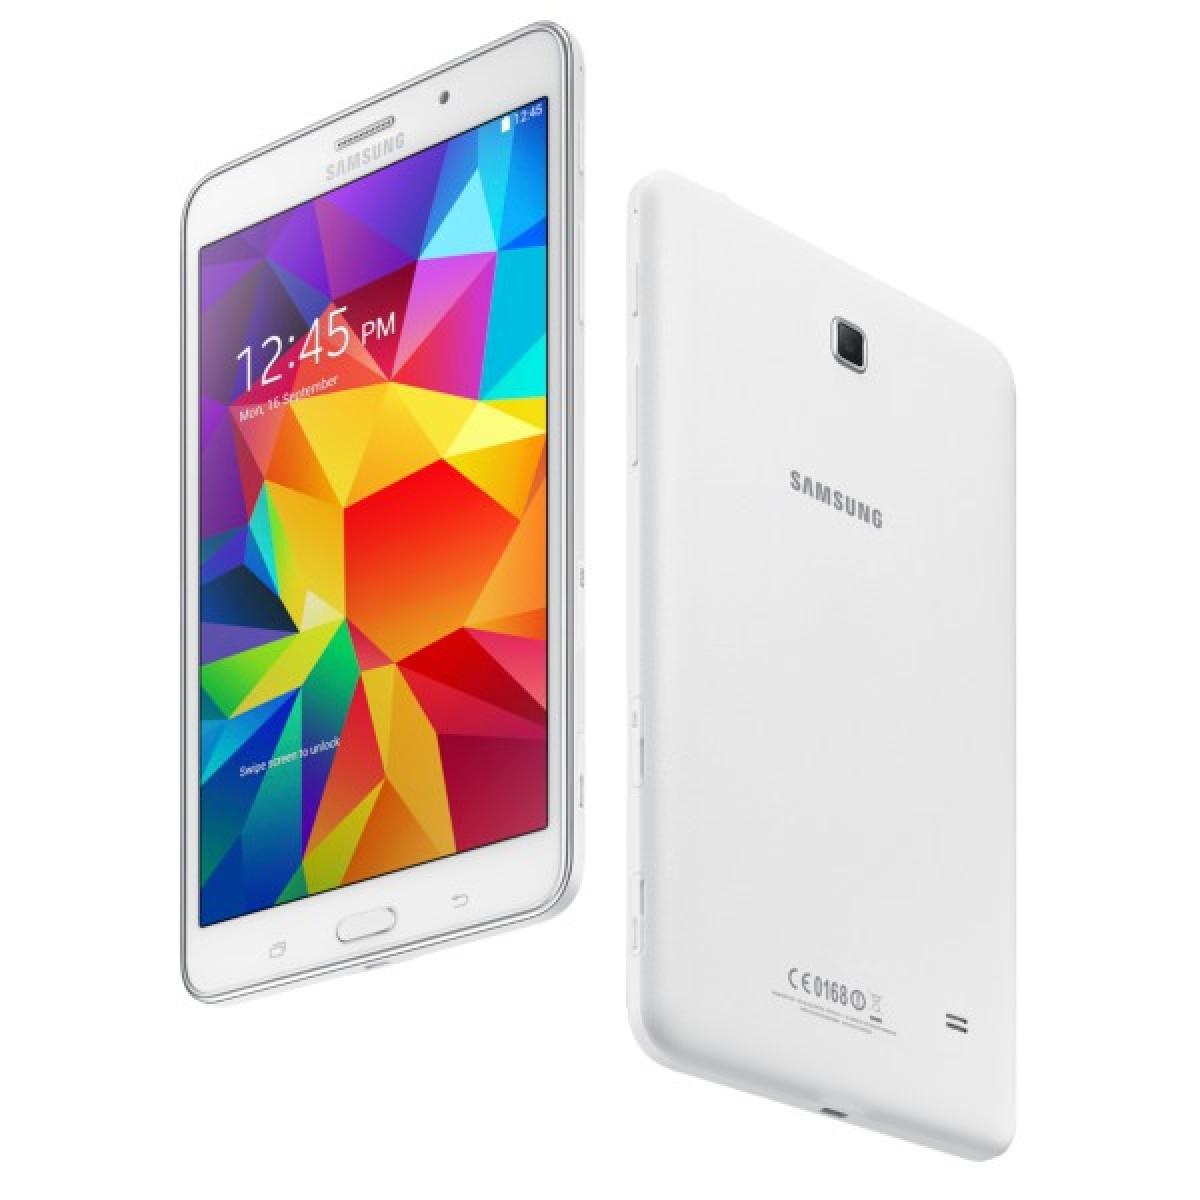 SAMSUNG Tablette Galaxy Tab 4 T231 2